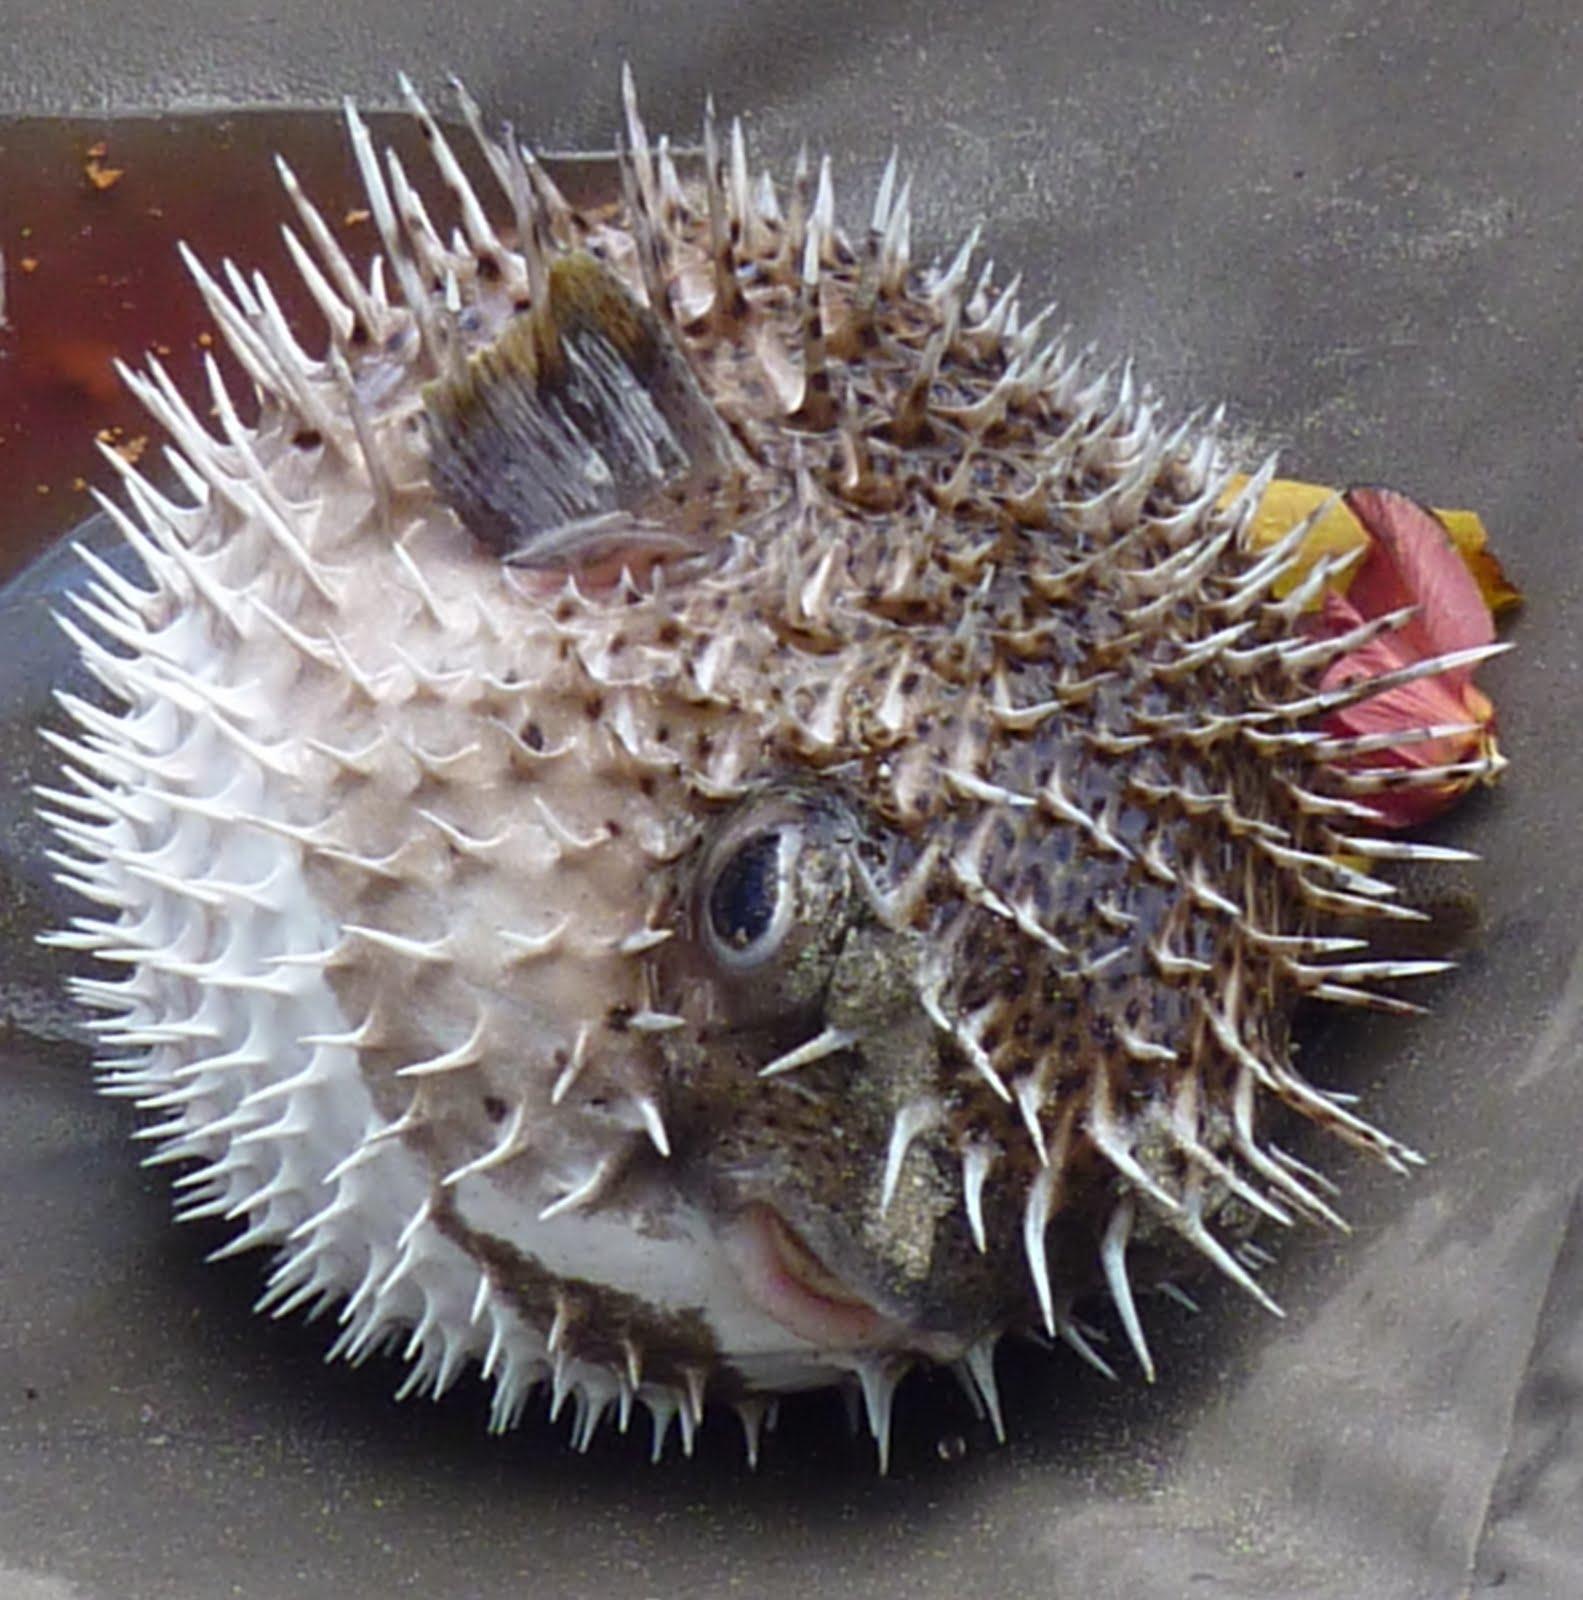 Peixe Porco Espinho ou Baiacu (Diodon hystrix)